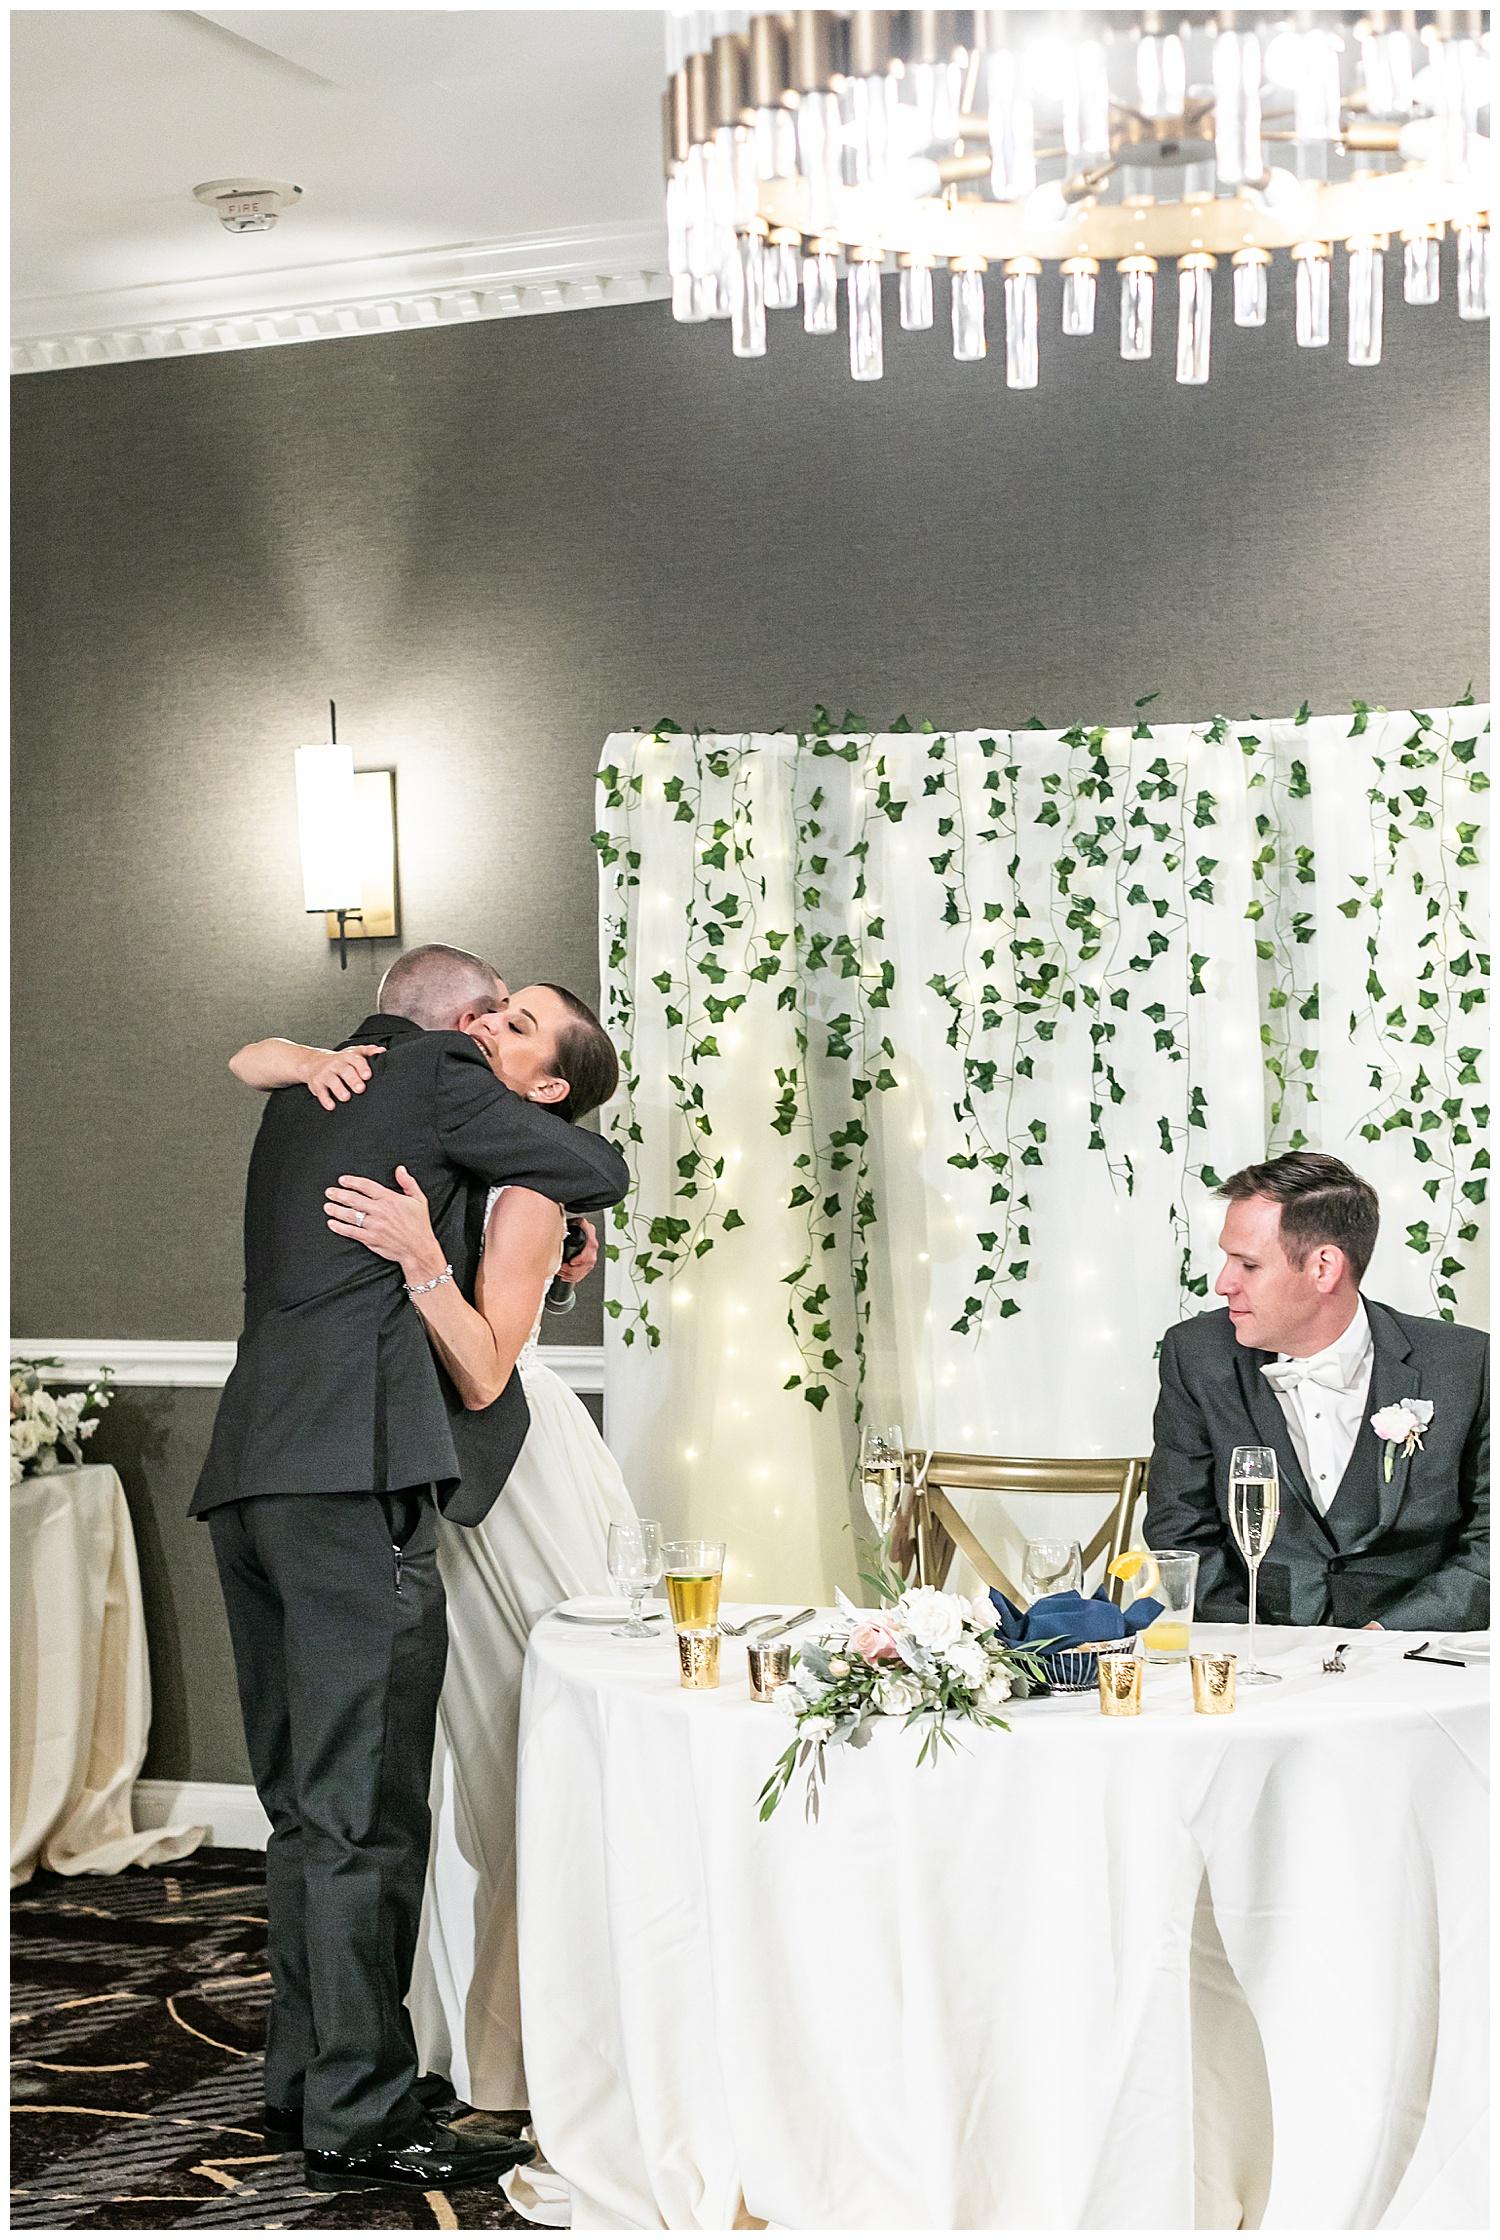 Lindsay Josh Eagles Nest Country Club Wedding Living Radiant Photography photos_0118.jpg